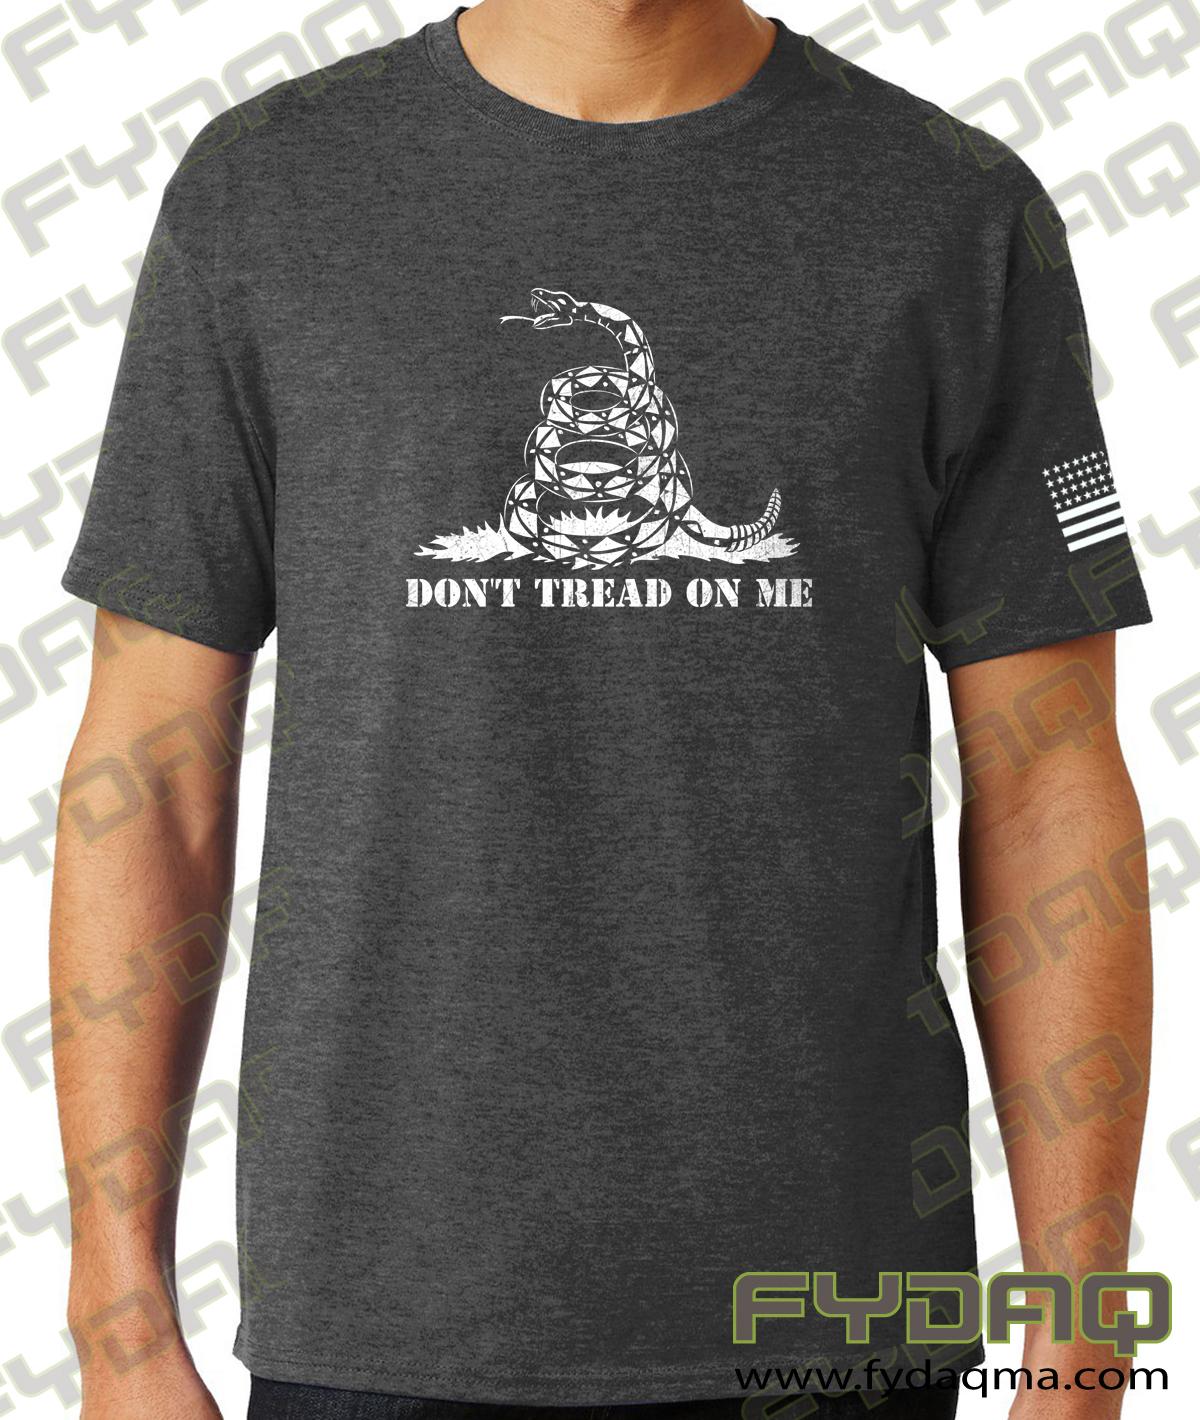 gadsden-flag-don't-tread-on-me-charcoal-heather-grey-tshirt-fydaq